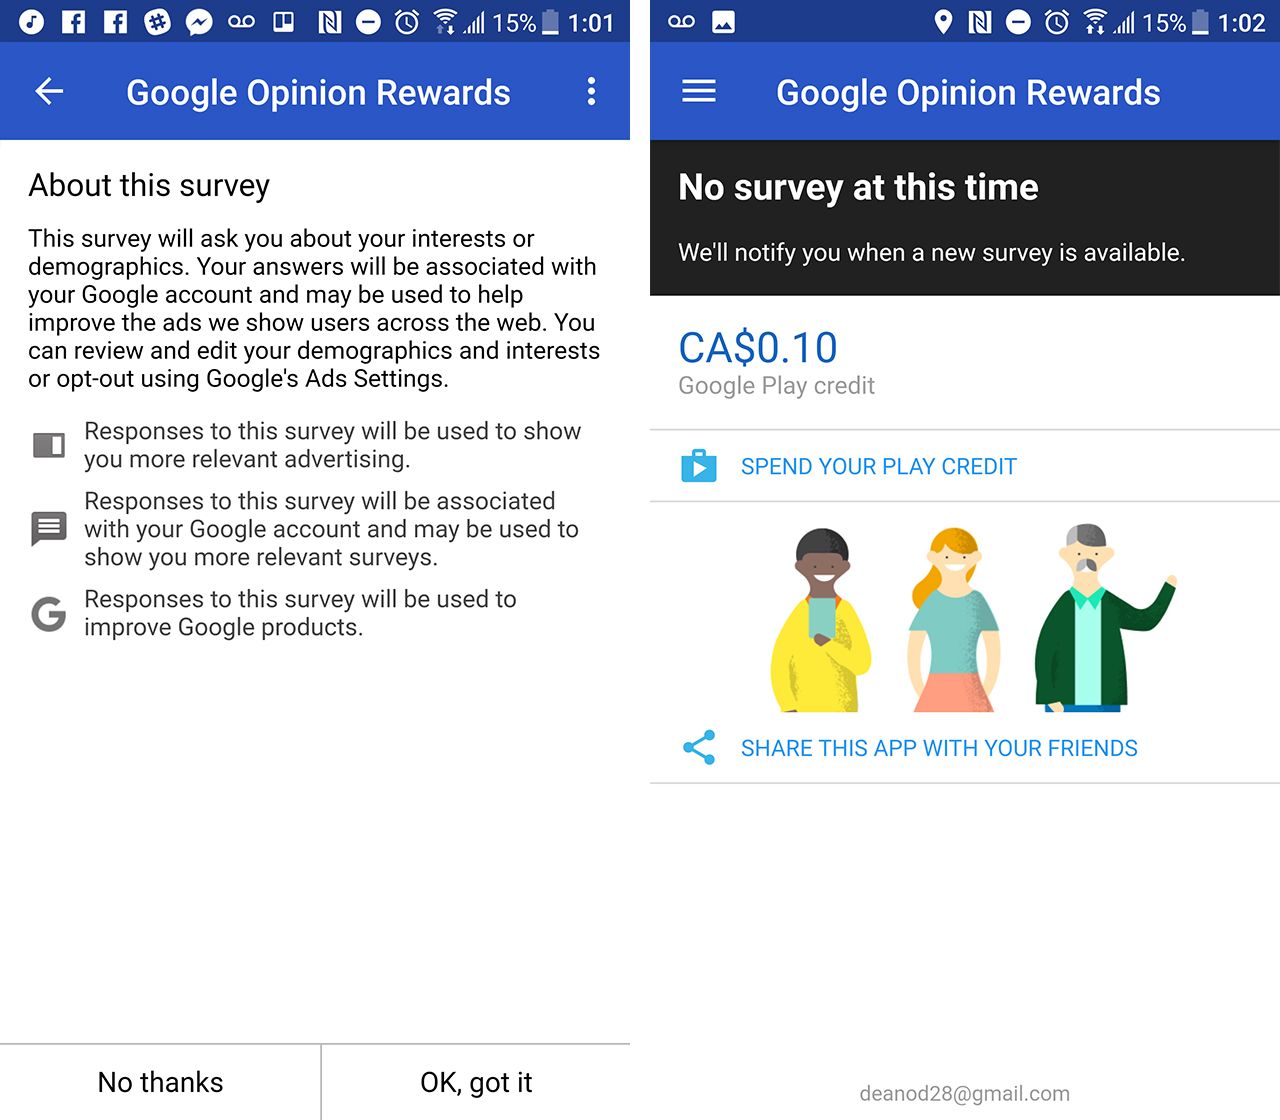 Google Opinions Rewards